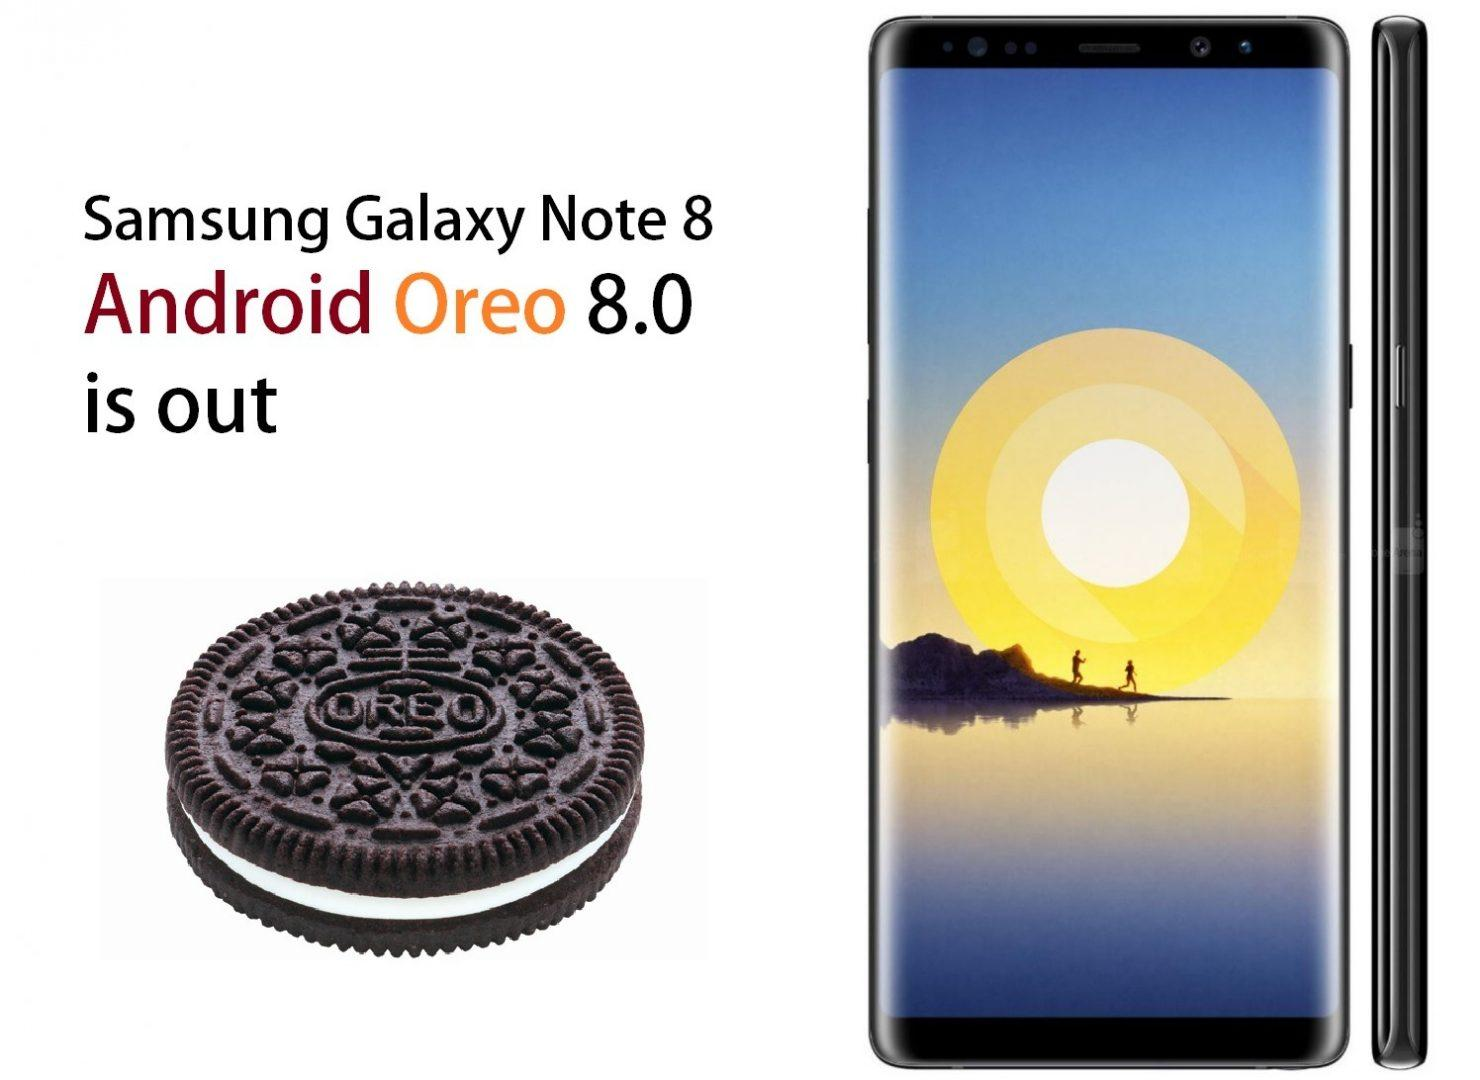 Galaxy Note 8 Android Oreo